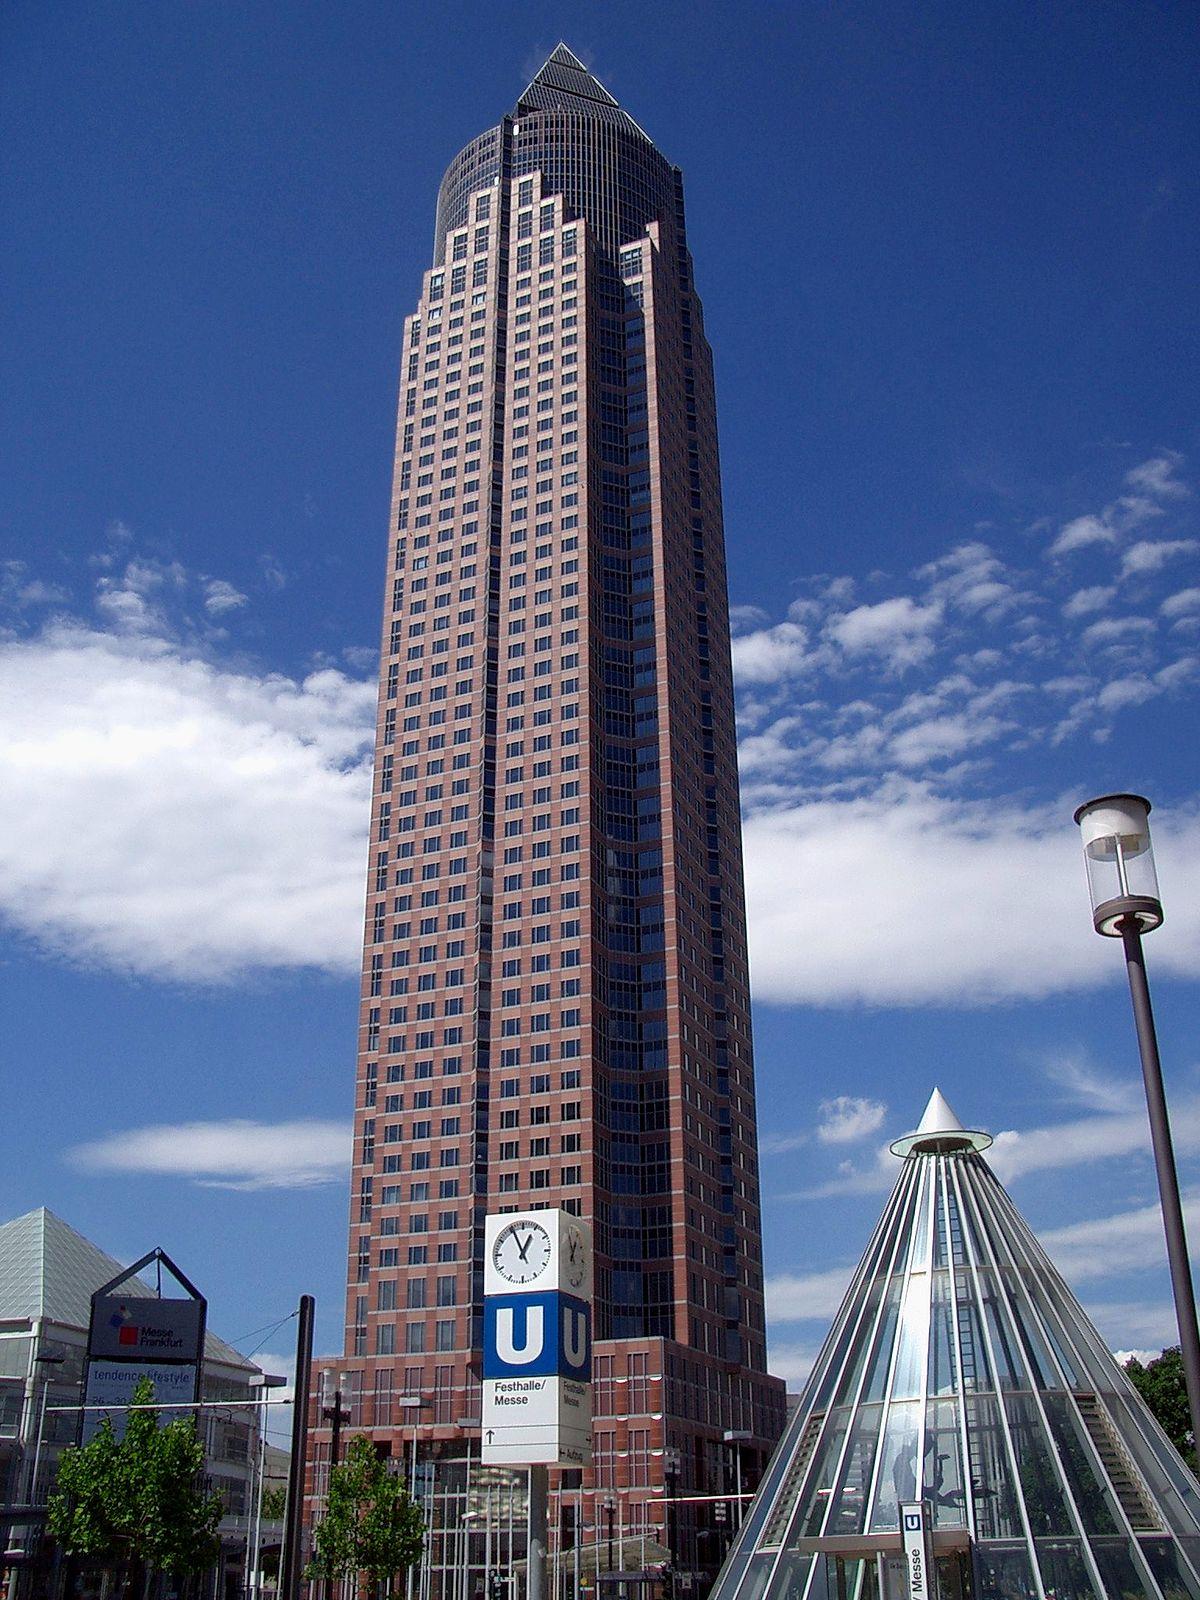 -Frankfurter_Messeturm